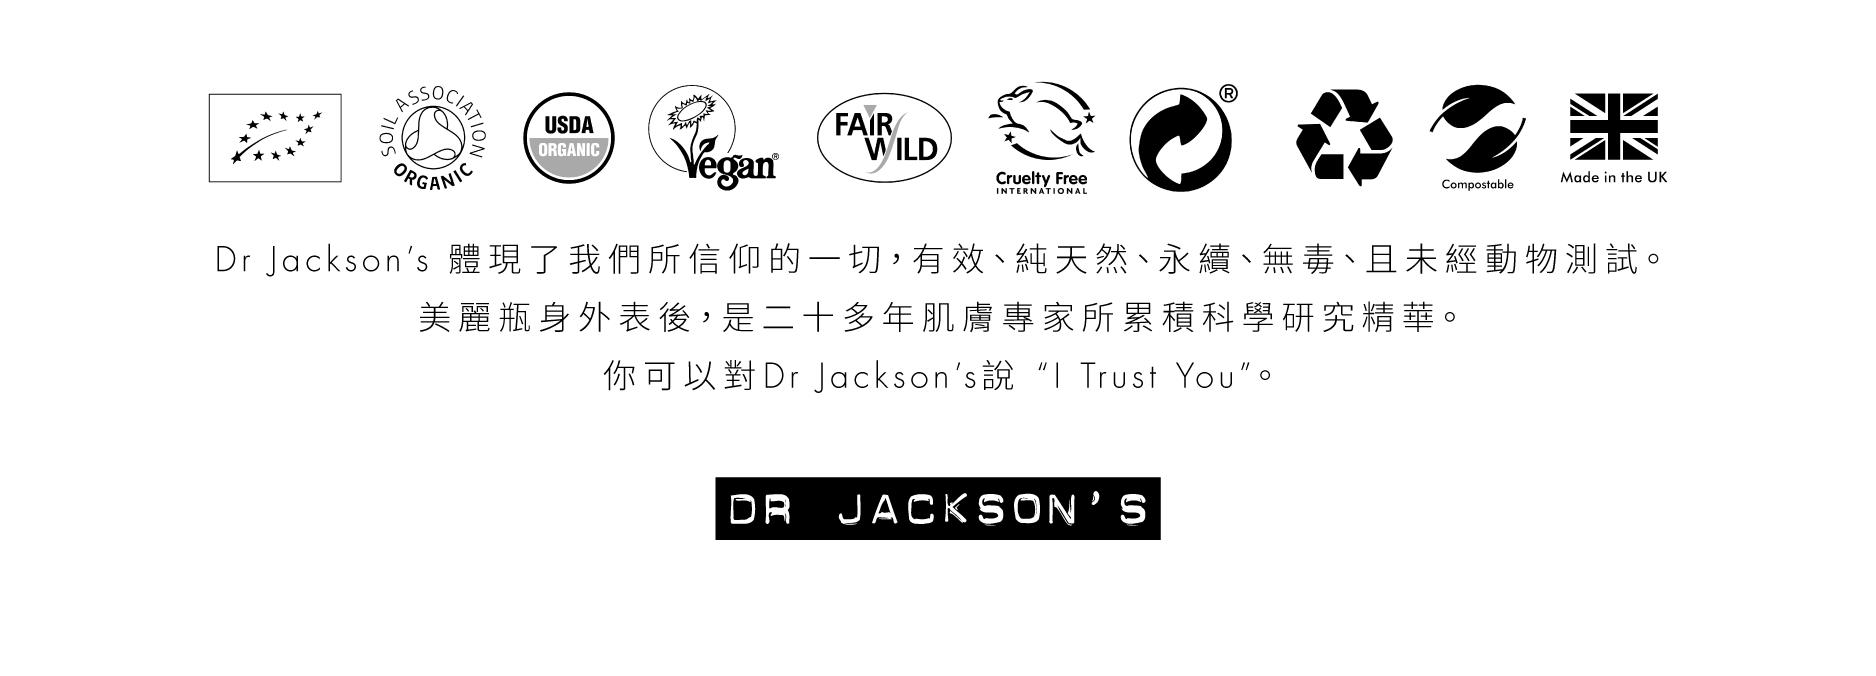 dr jackson's